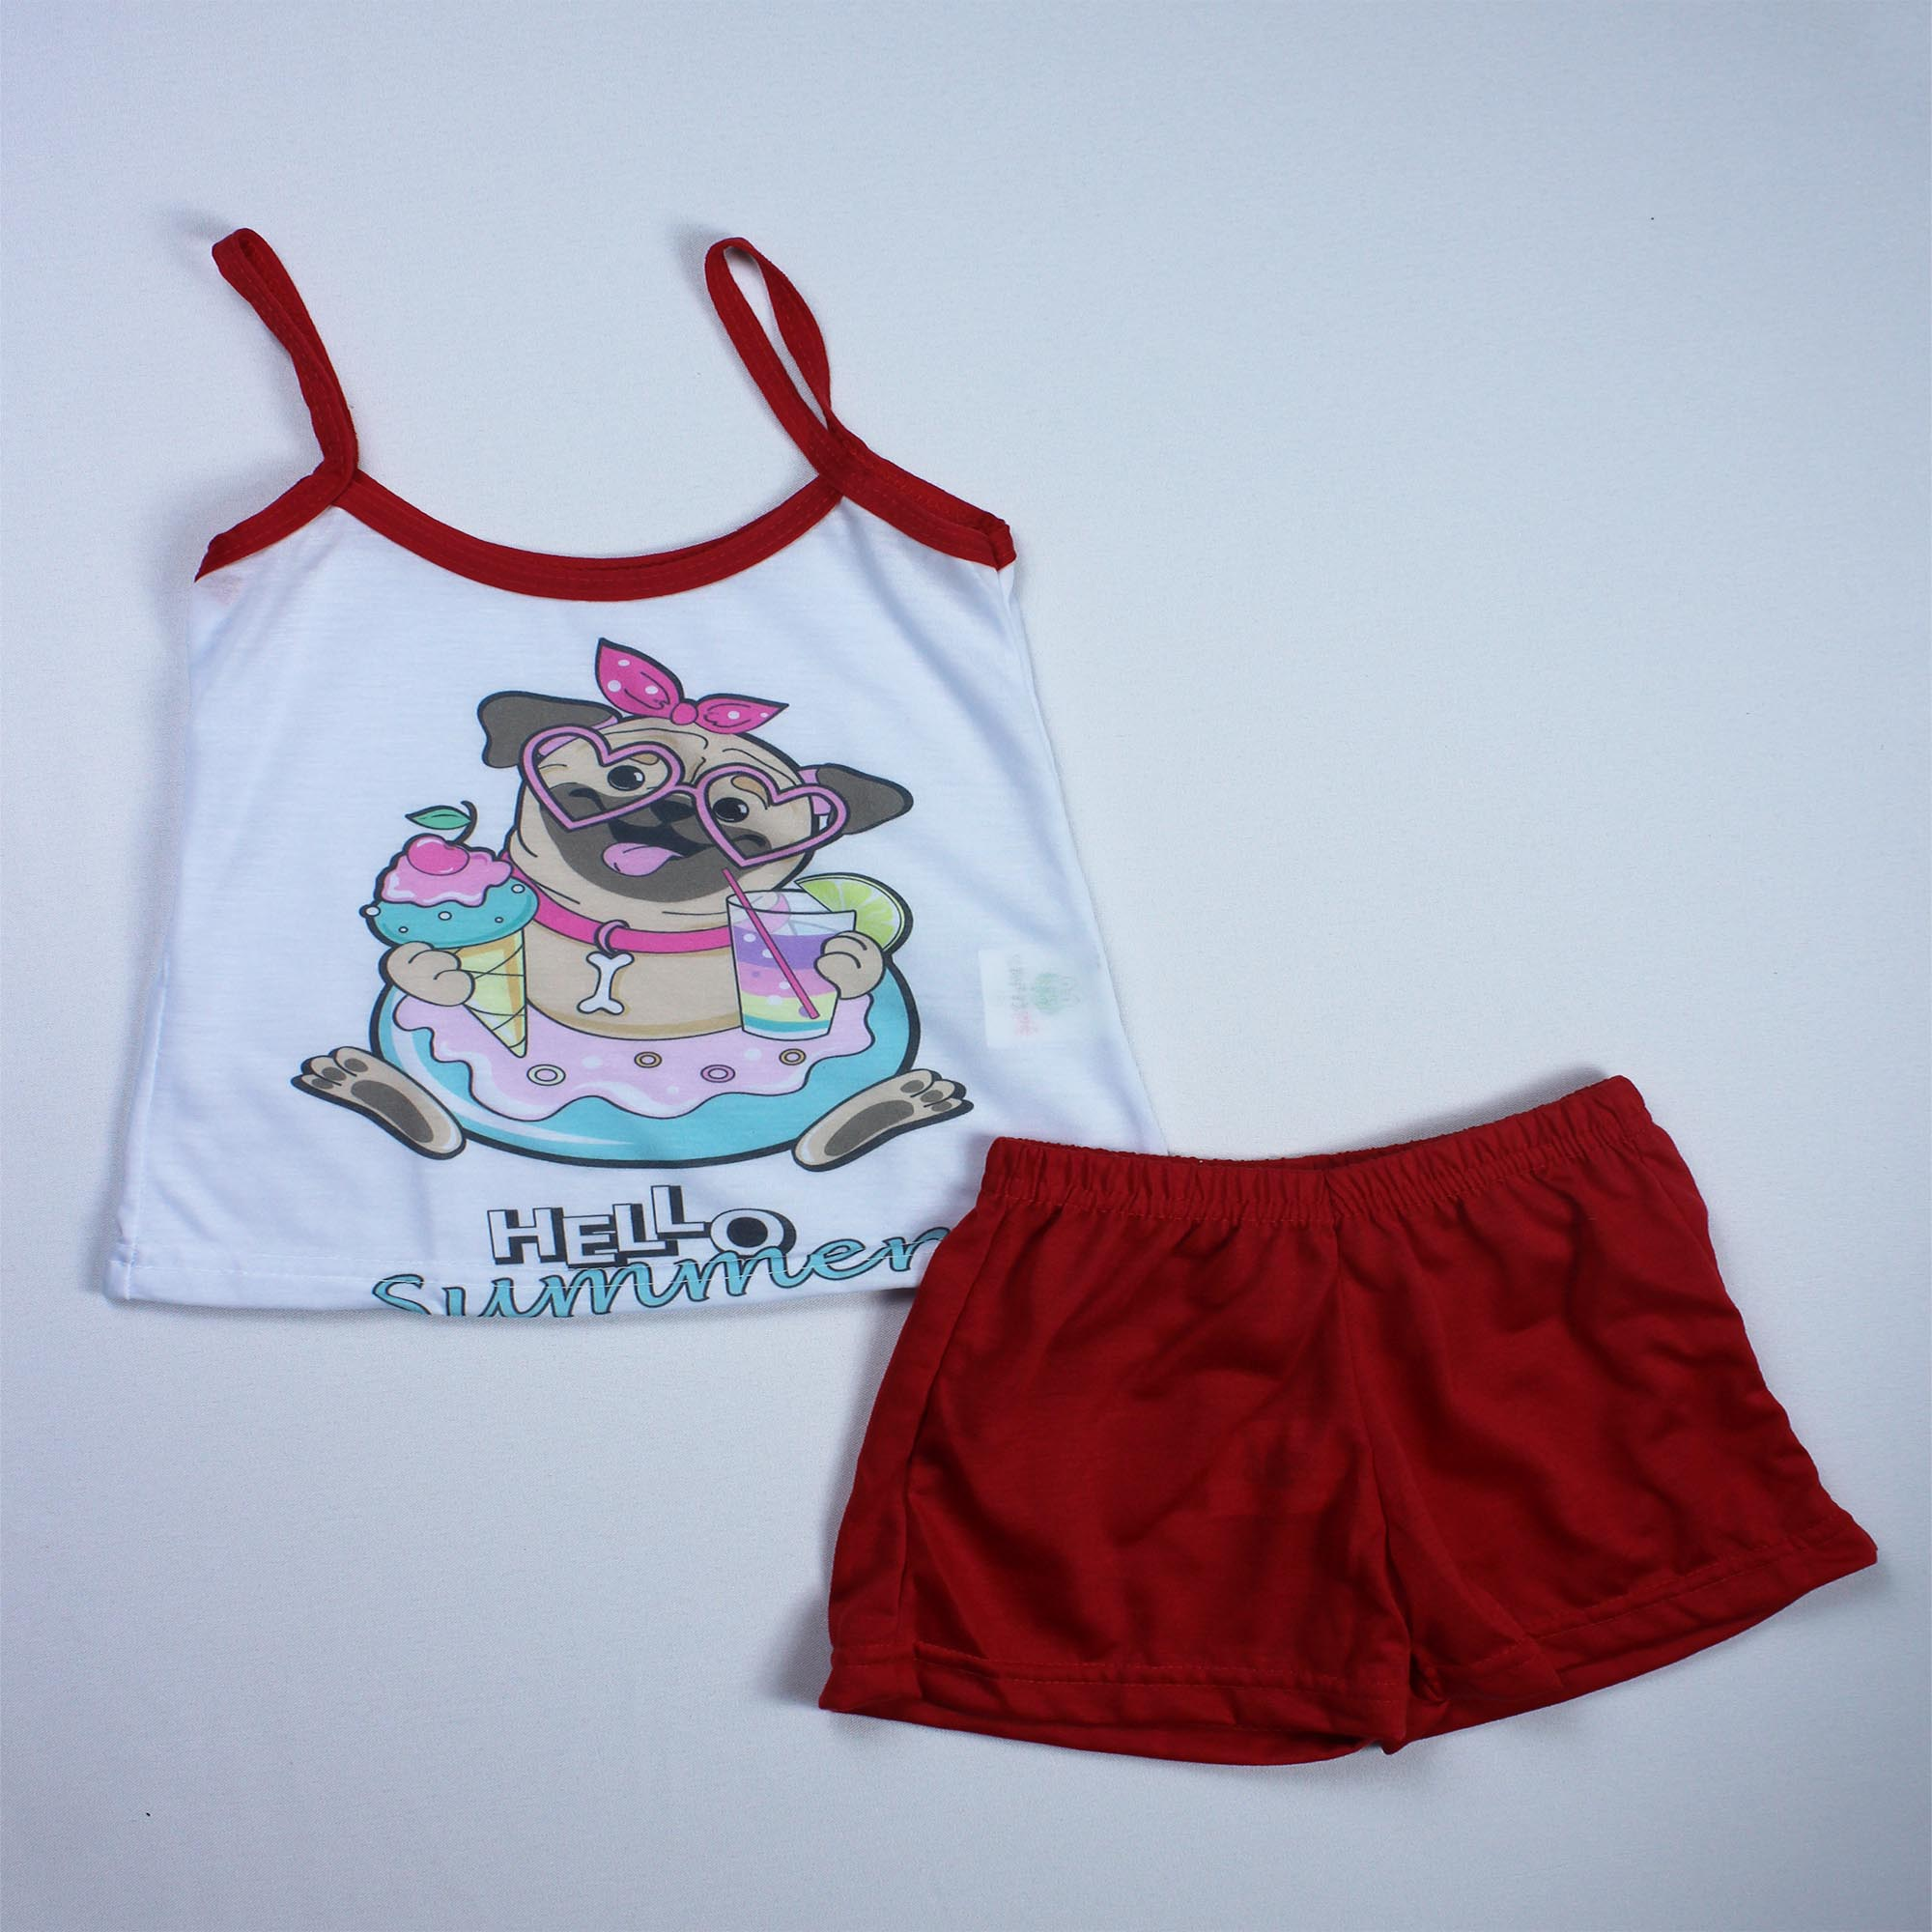 Pijama Regata Infantil Menina - Tamanho 4